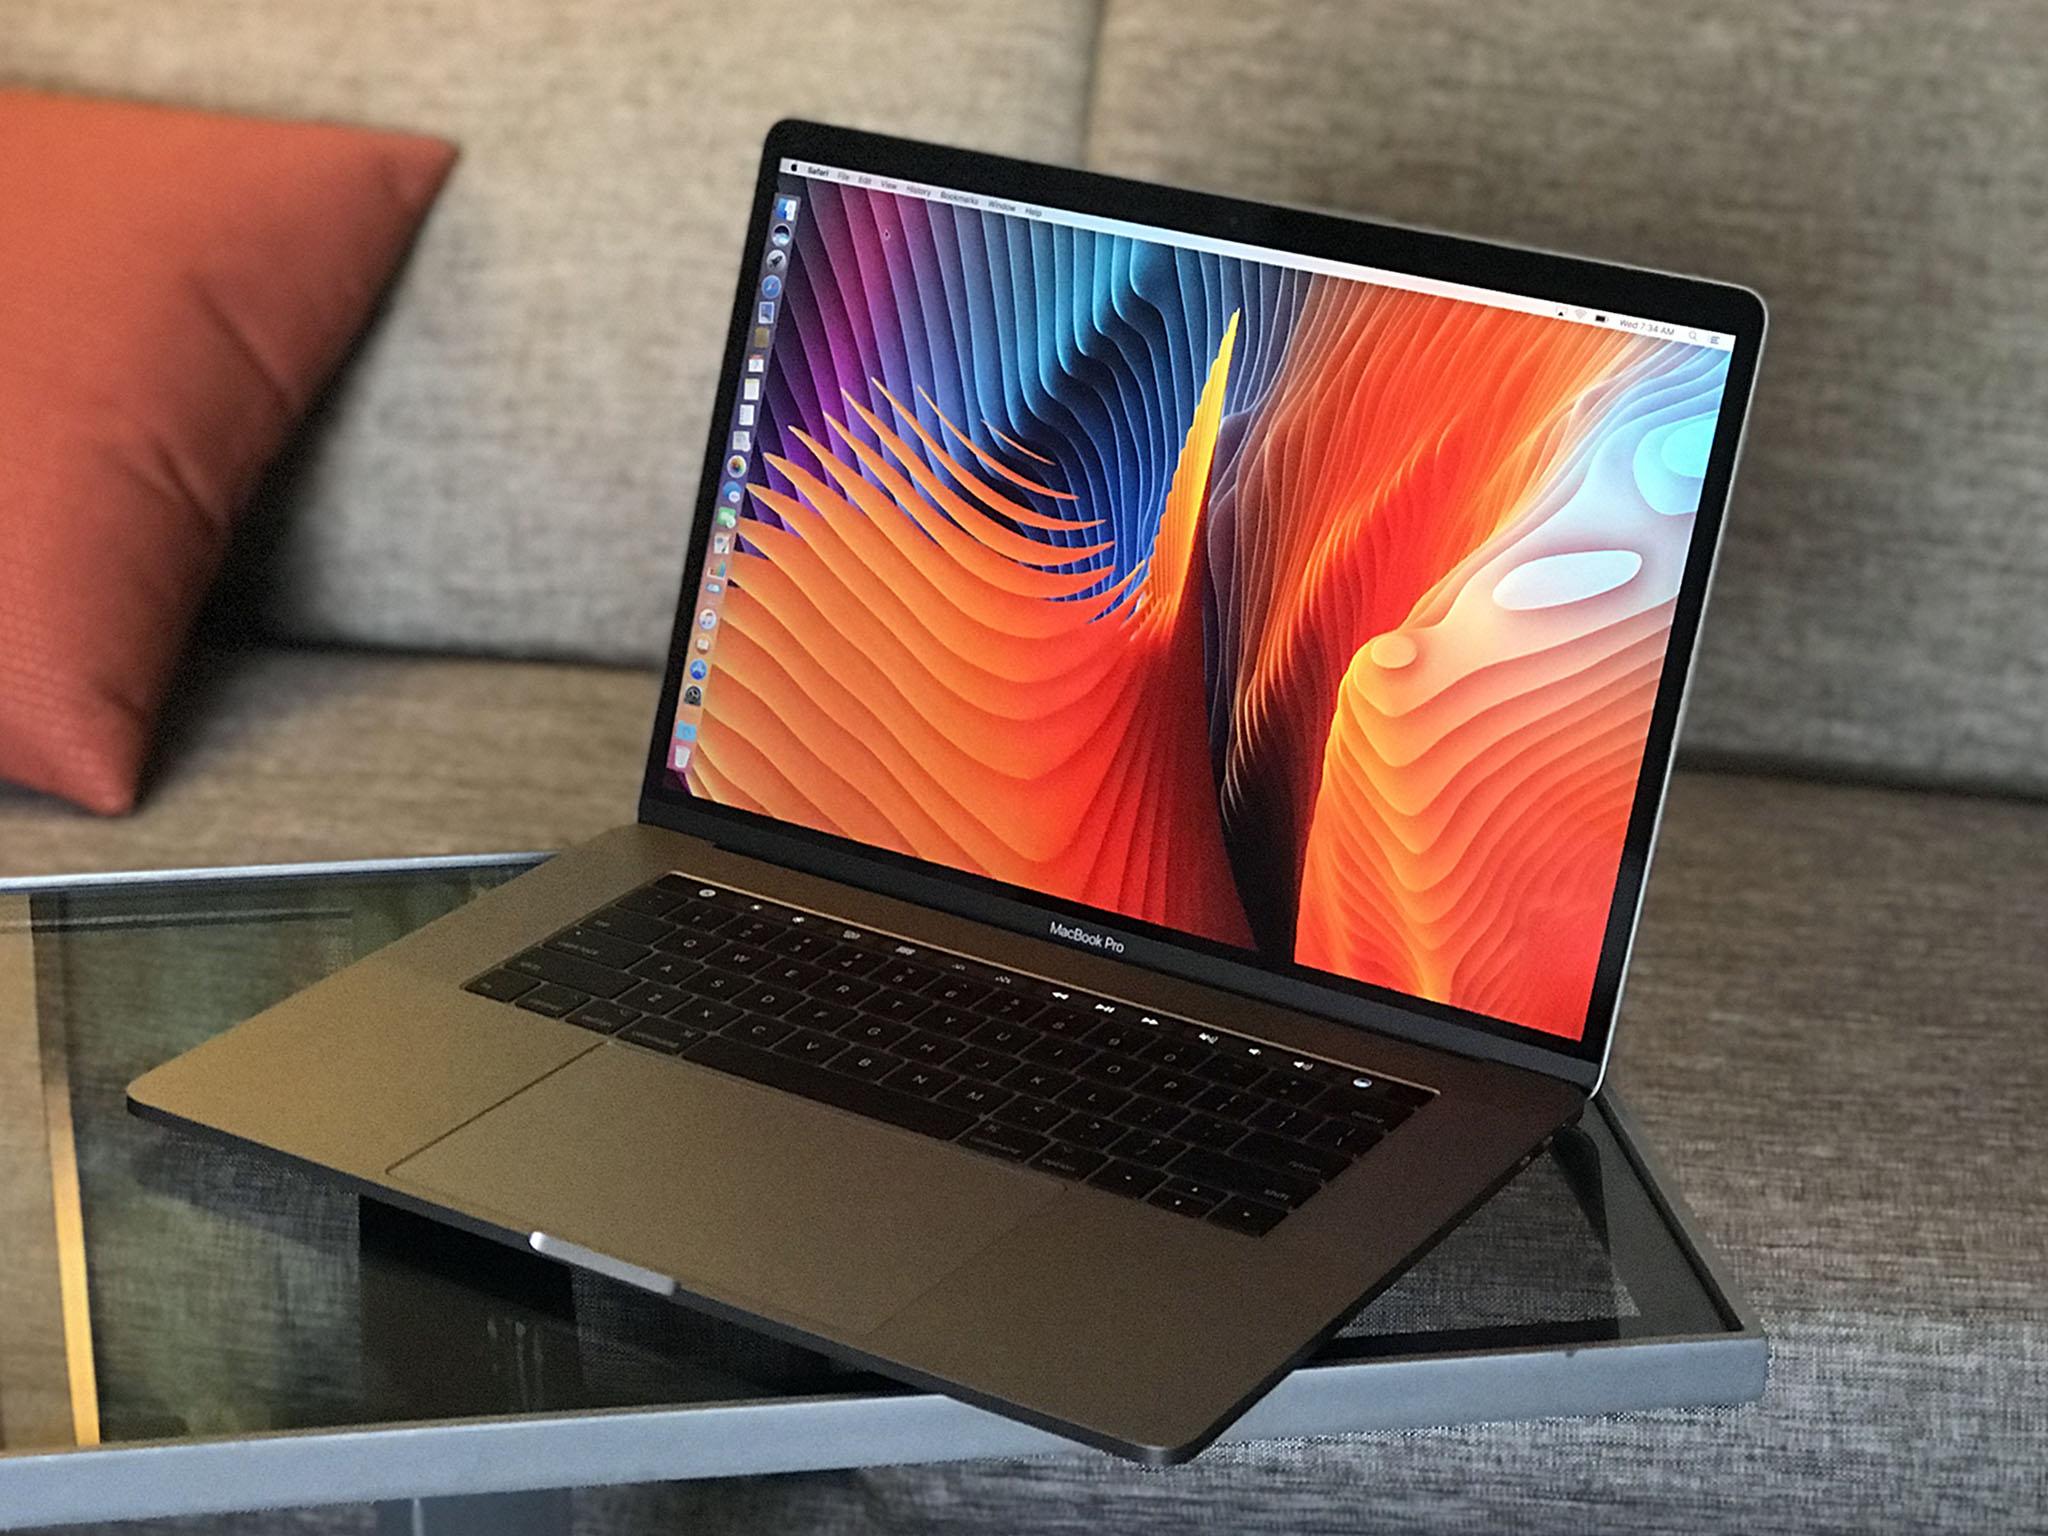 Mac Pro Fall Wallpaper 2017 Macbook Pro 2017 Review Enter Kaby Lake Imore